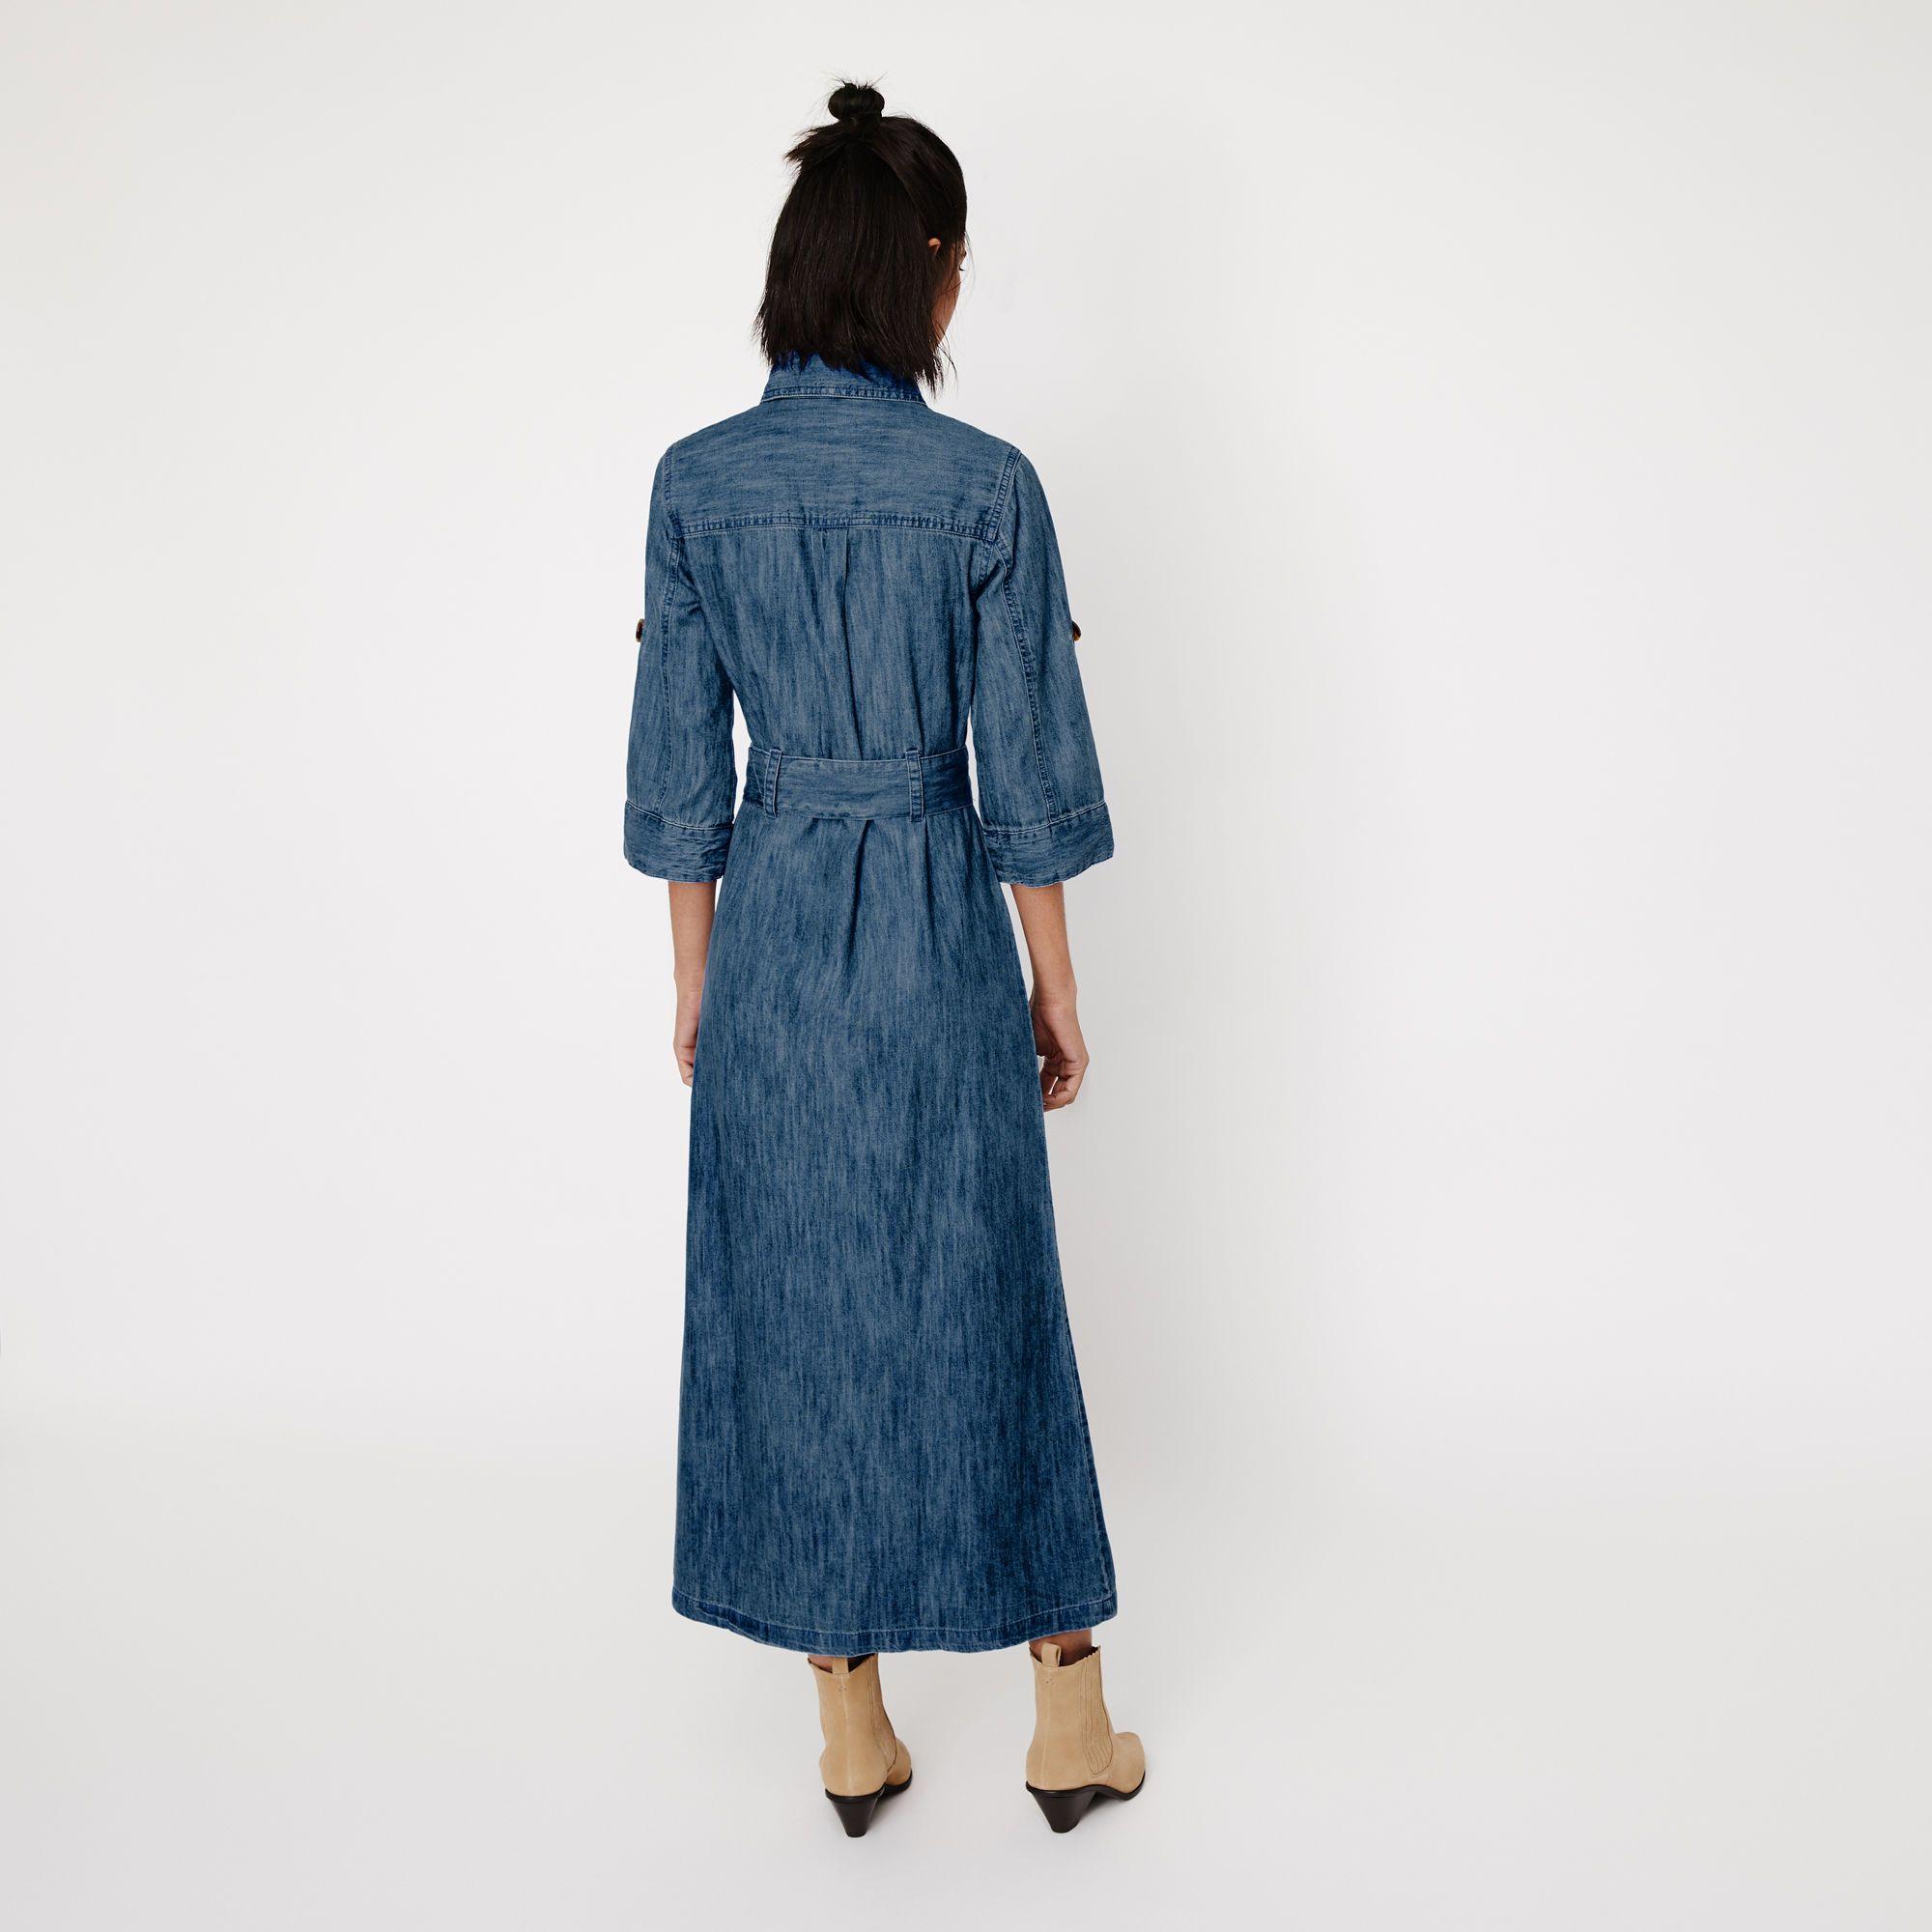 Warehouse, DENIM MAXI SHIRT DRESS Light Wash Denim 3 | Dresses ...